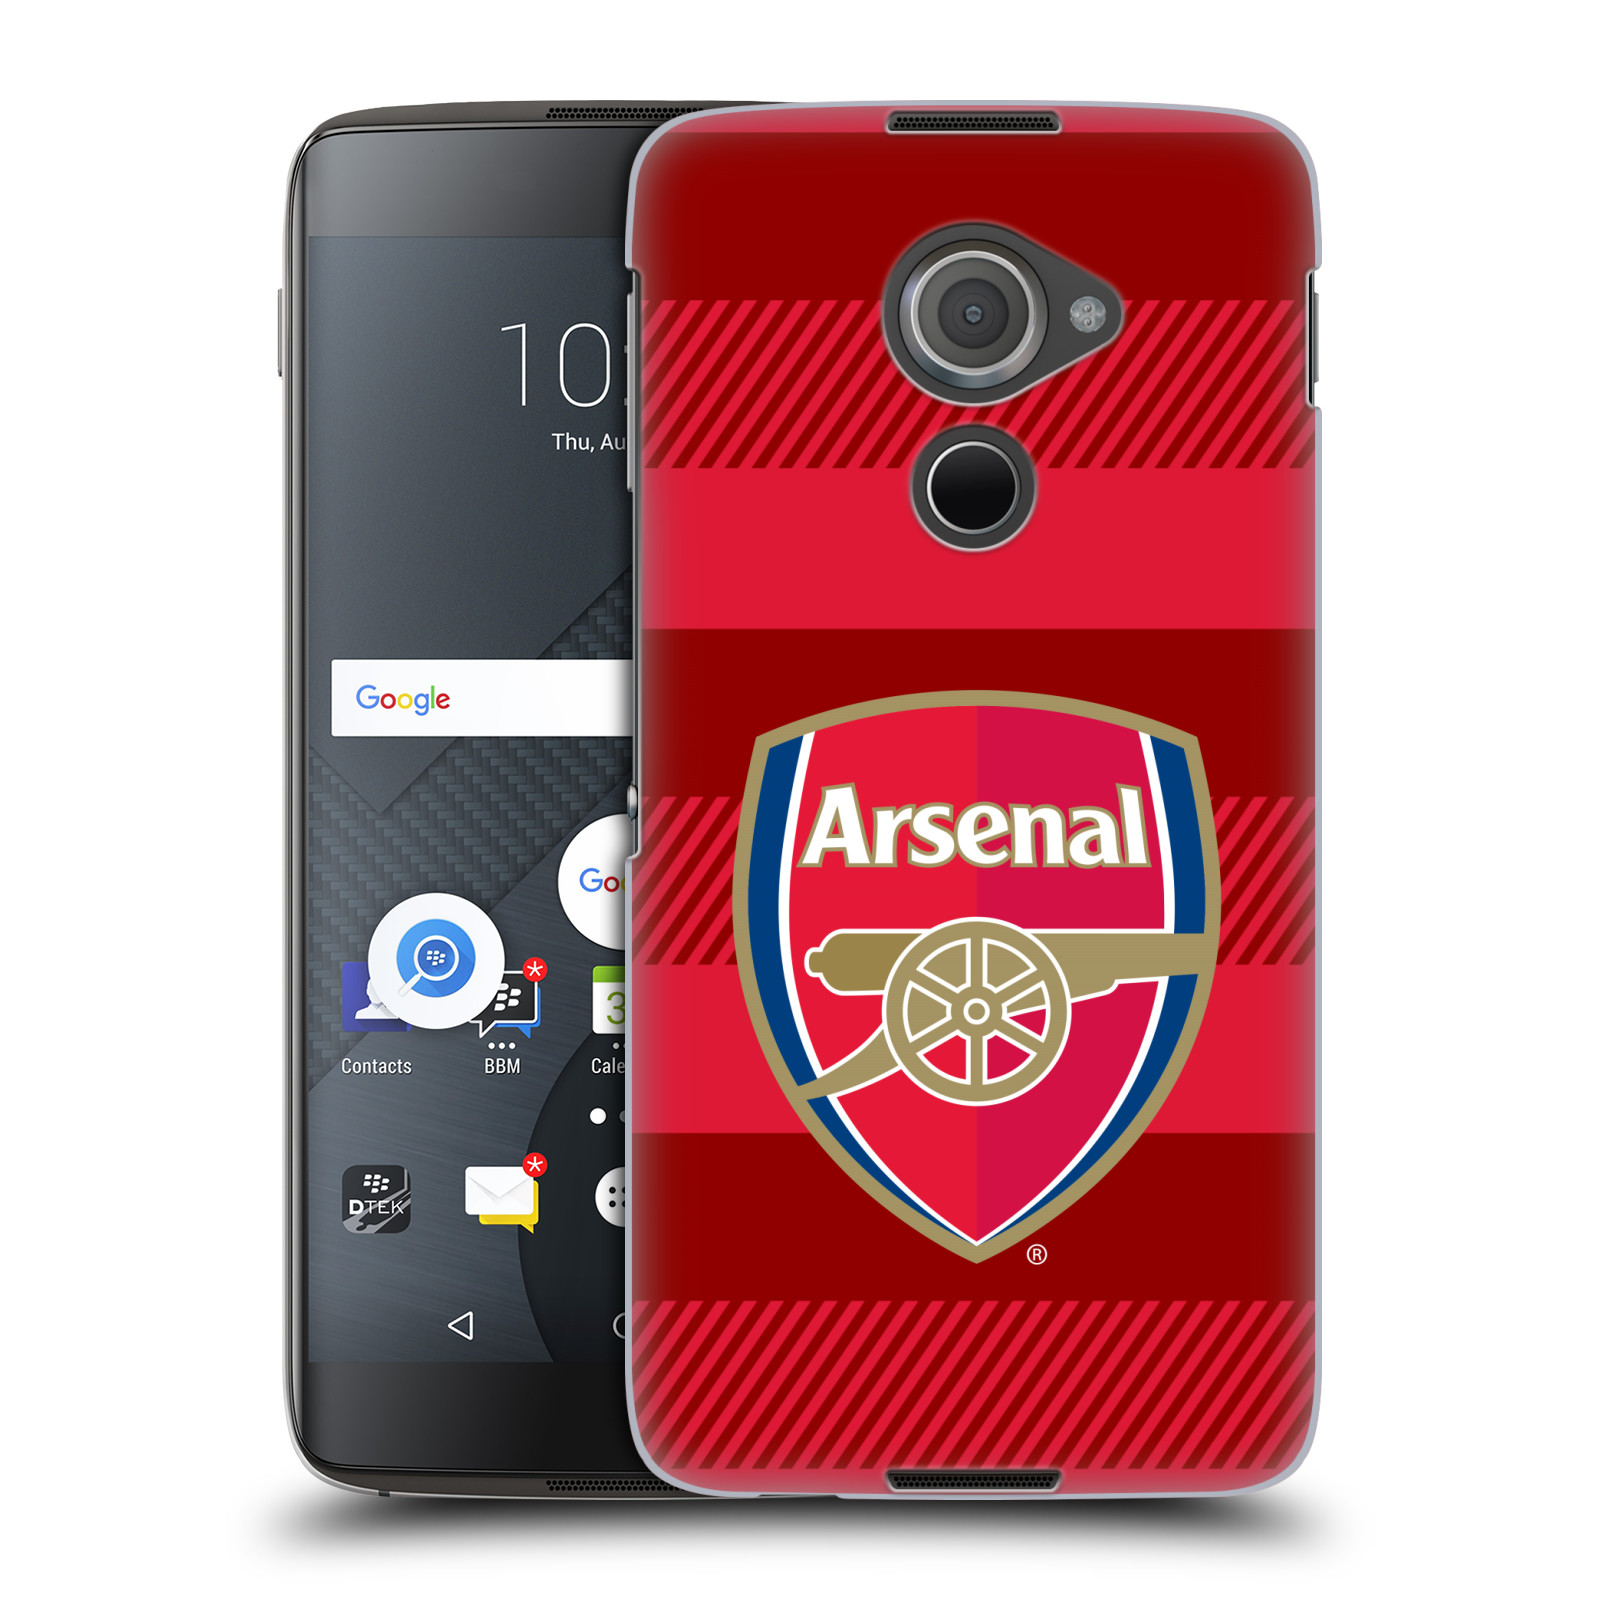 Plastové pouzdro na mobil Blackberry DTEK60 (Argon) - Head Case - Arsenal FC - Logo s pruhy